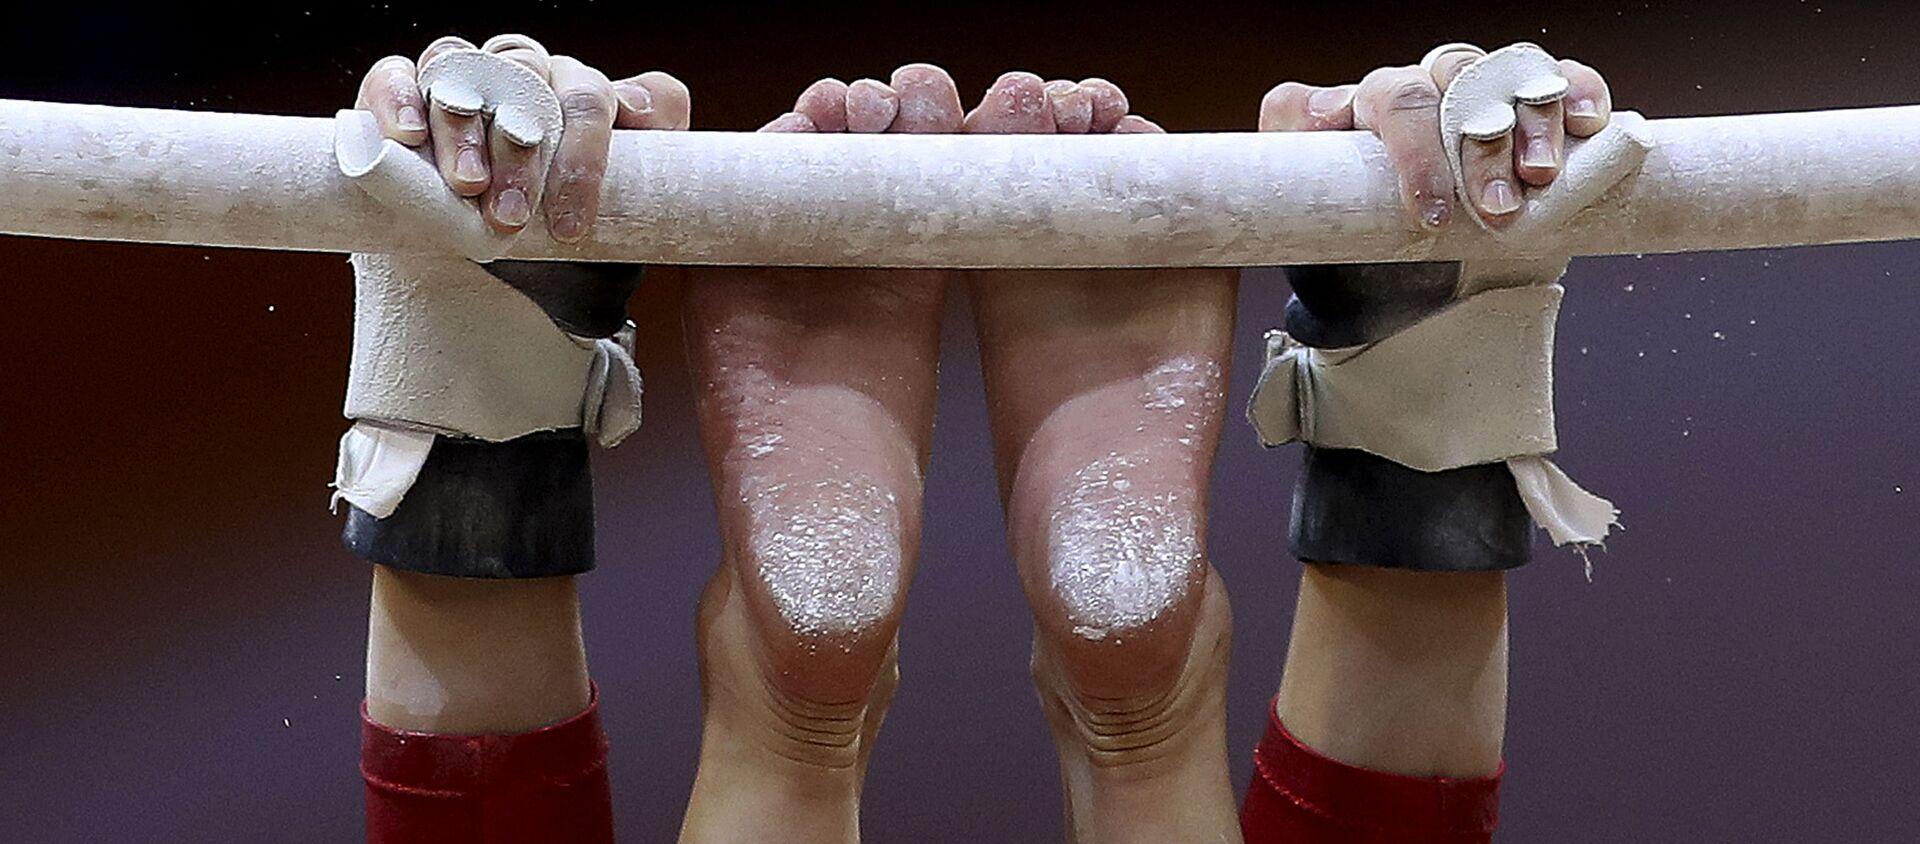 Спортивная гимнастика, фото из архива - Sputnik Азербайджан, 1920, 10.04.2021